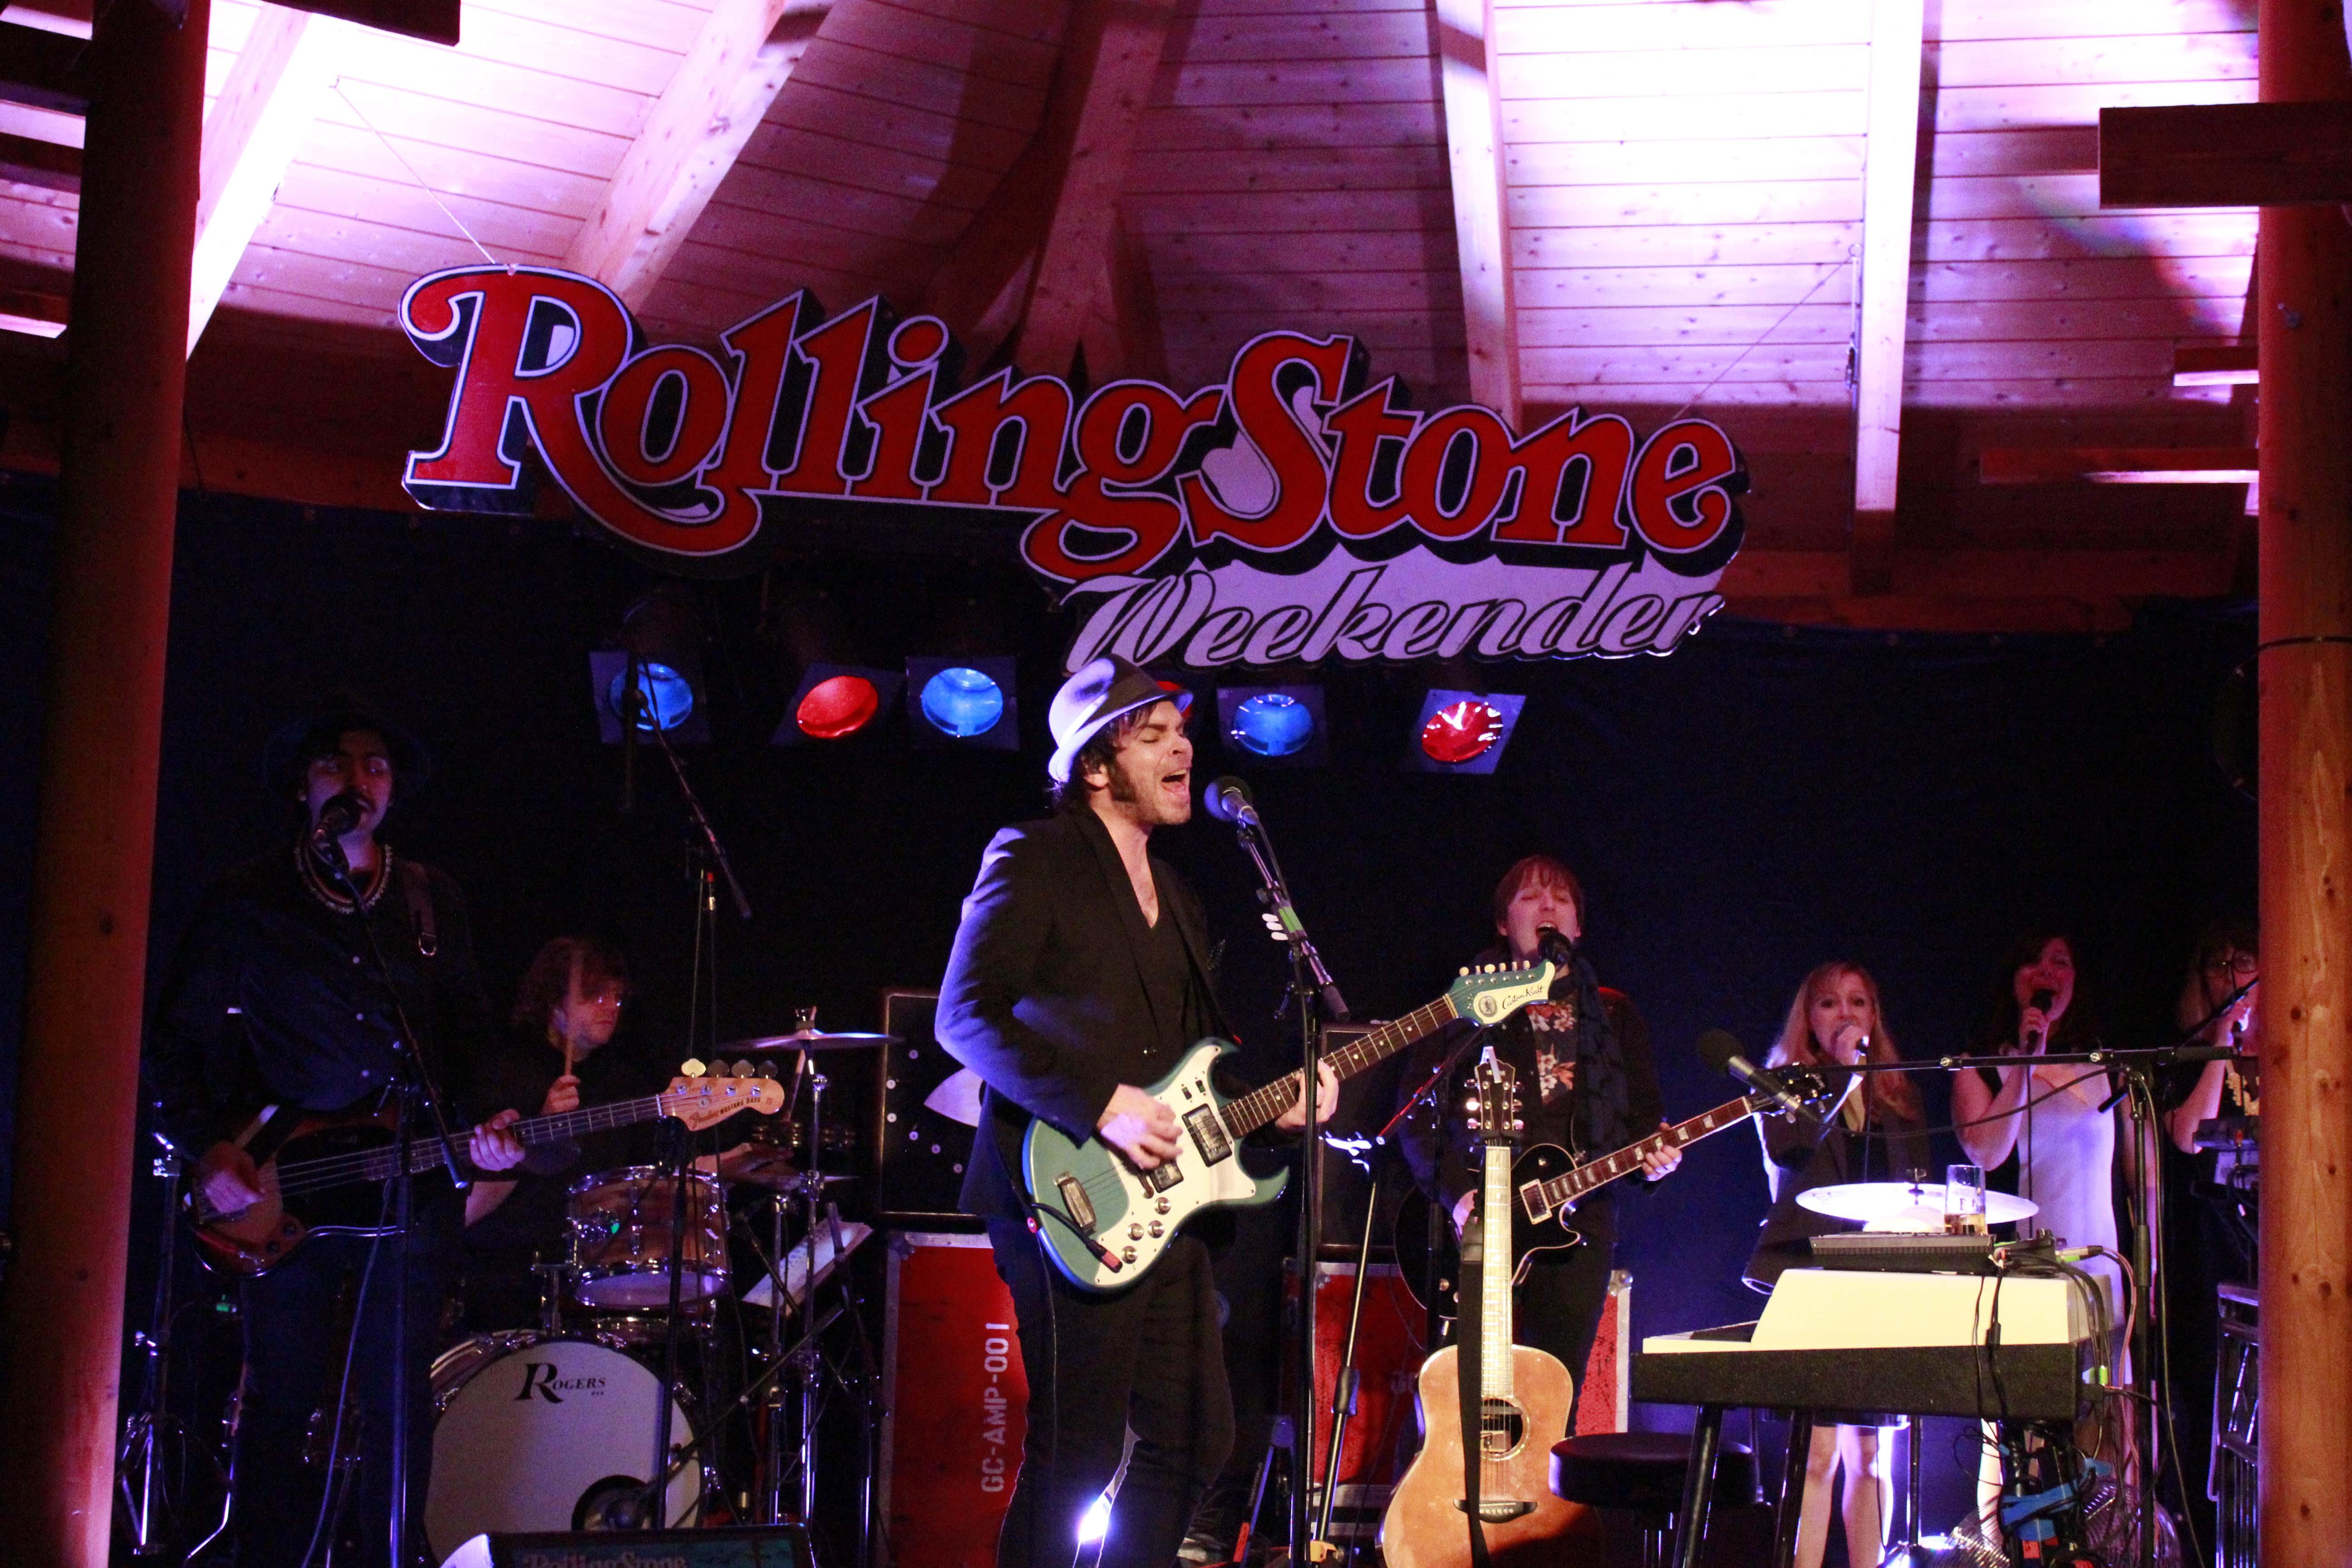 Gaz Coombes live beim ROLLING STONE Weekender 2015